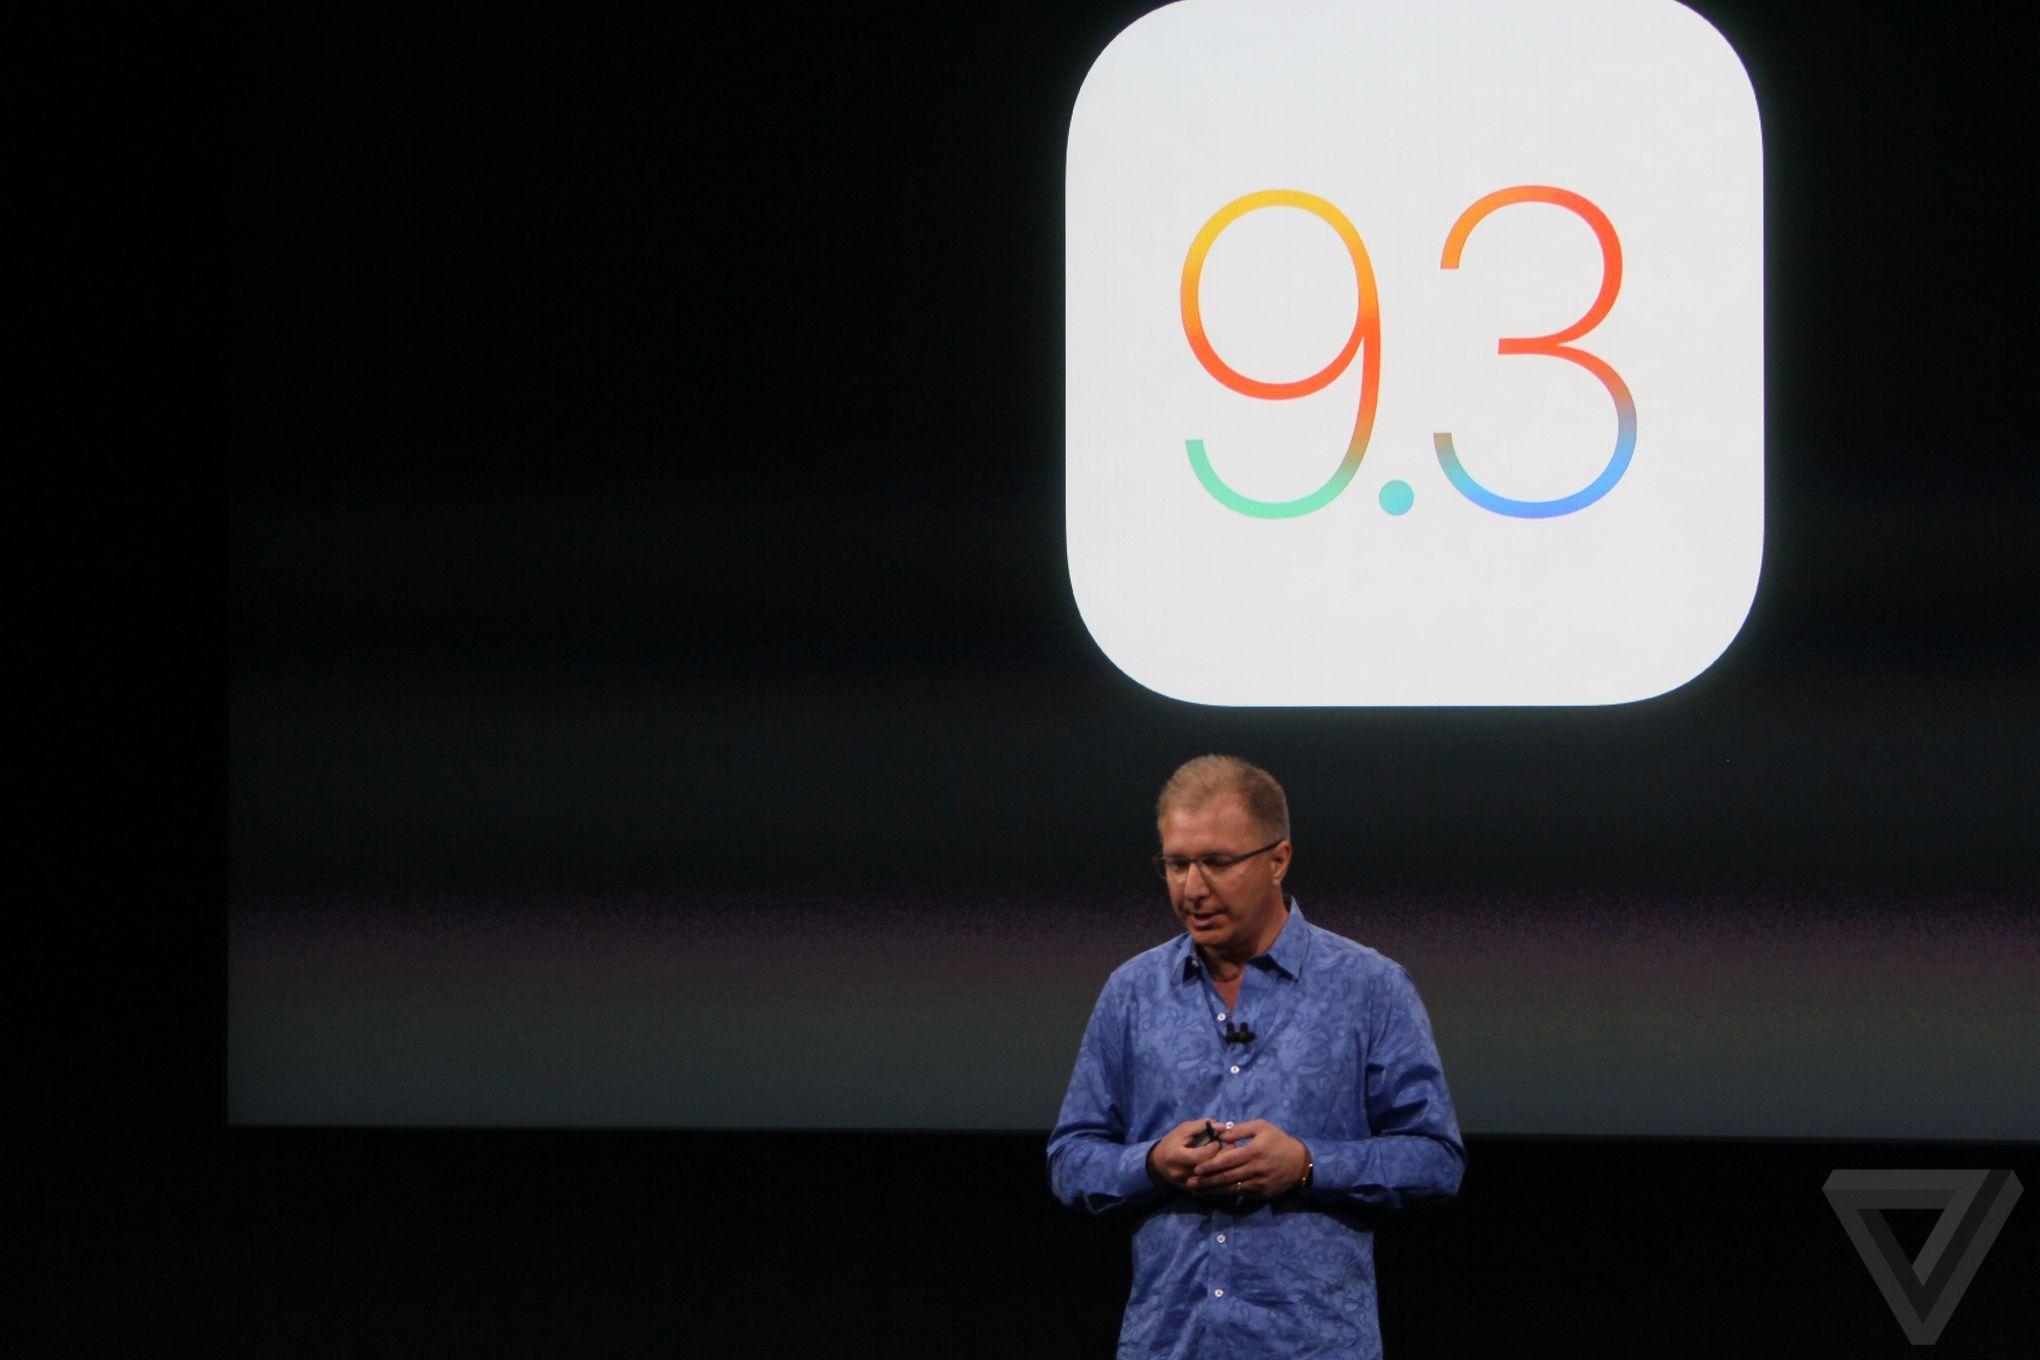 ios 9 3 2 Bilan keynote Let Us Loop You In : iPhone SE, iPad Pro 9,7 pouces...